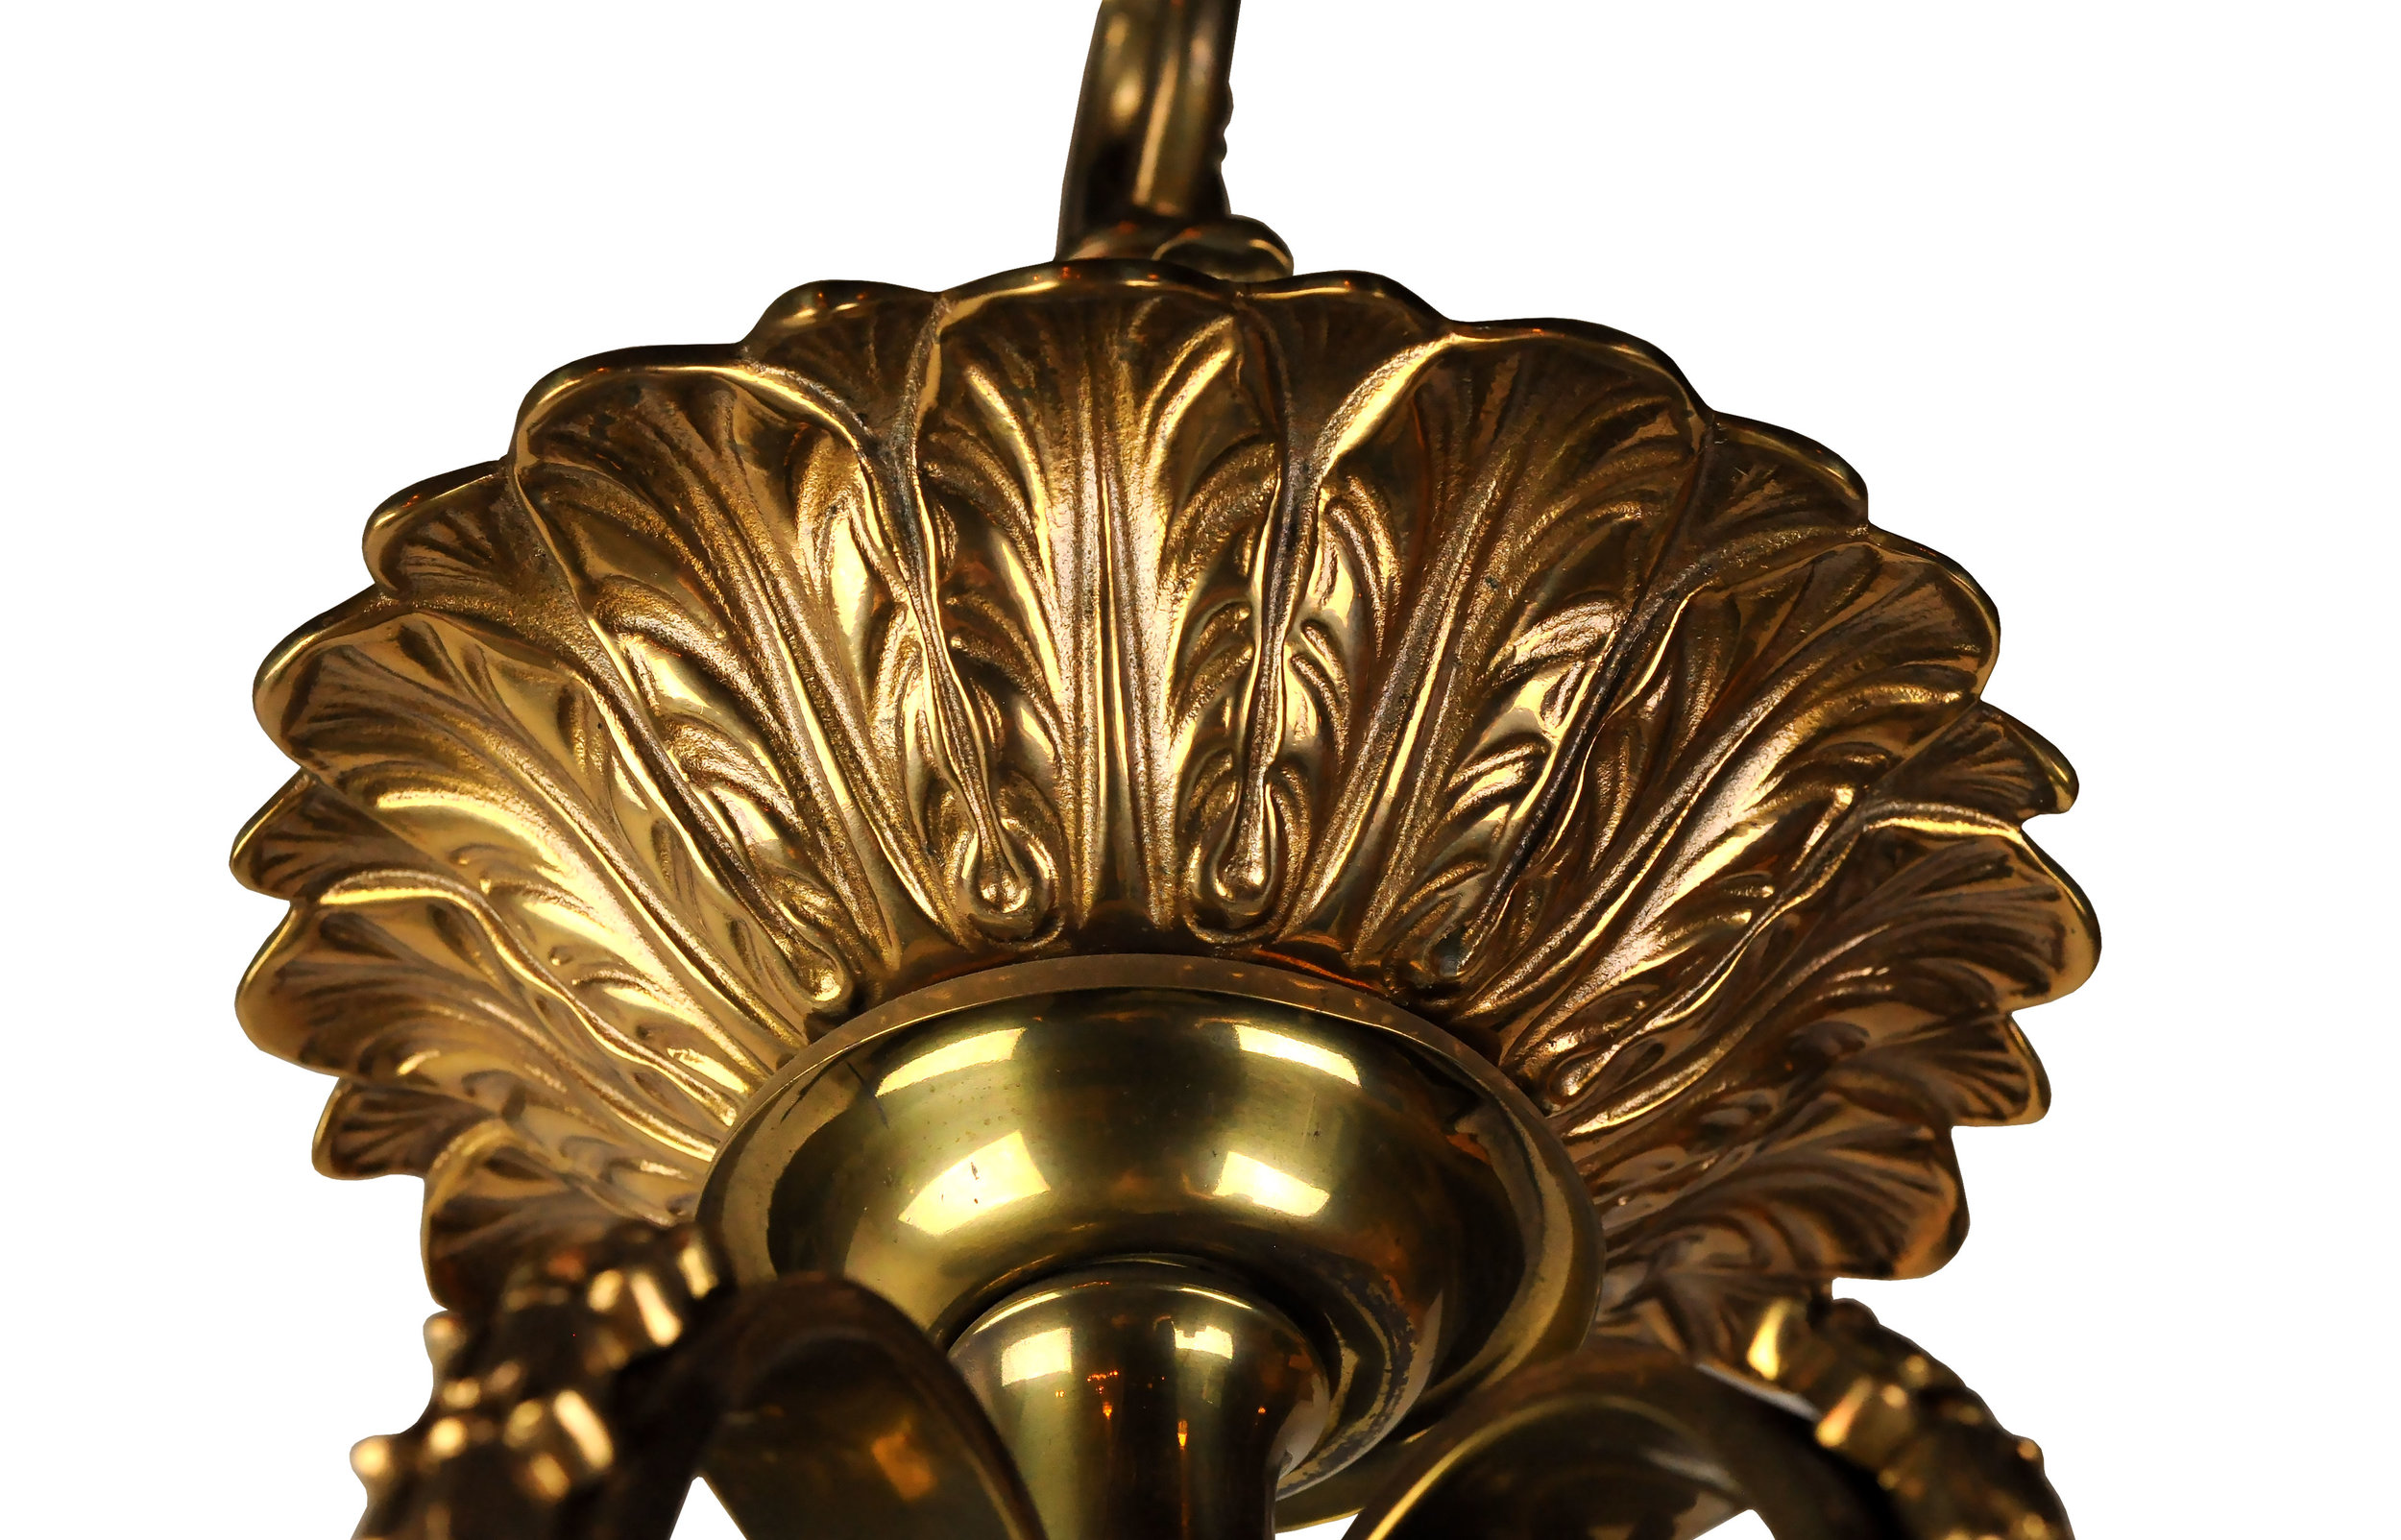 47134-bronze-bowl-chandelier-canopy.jpg